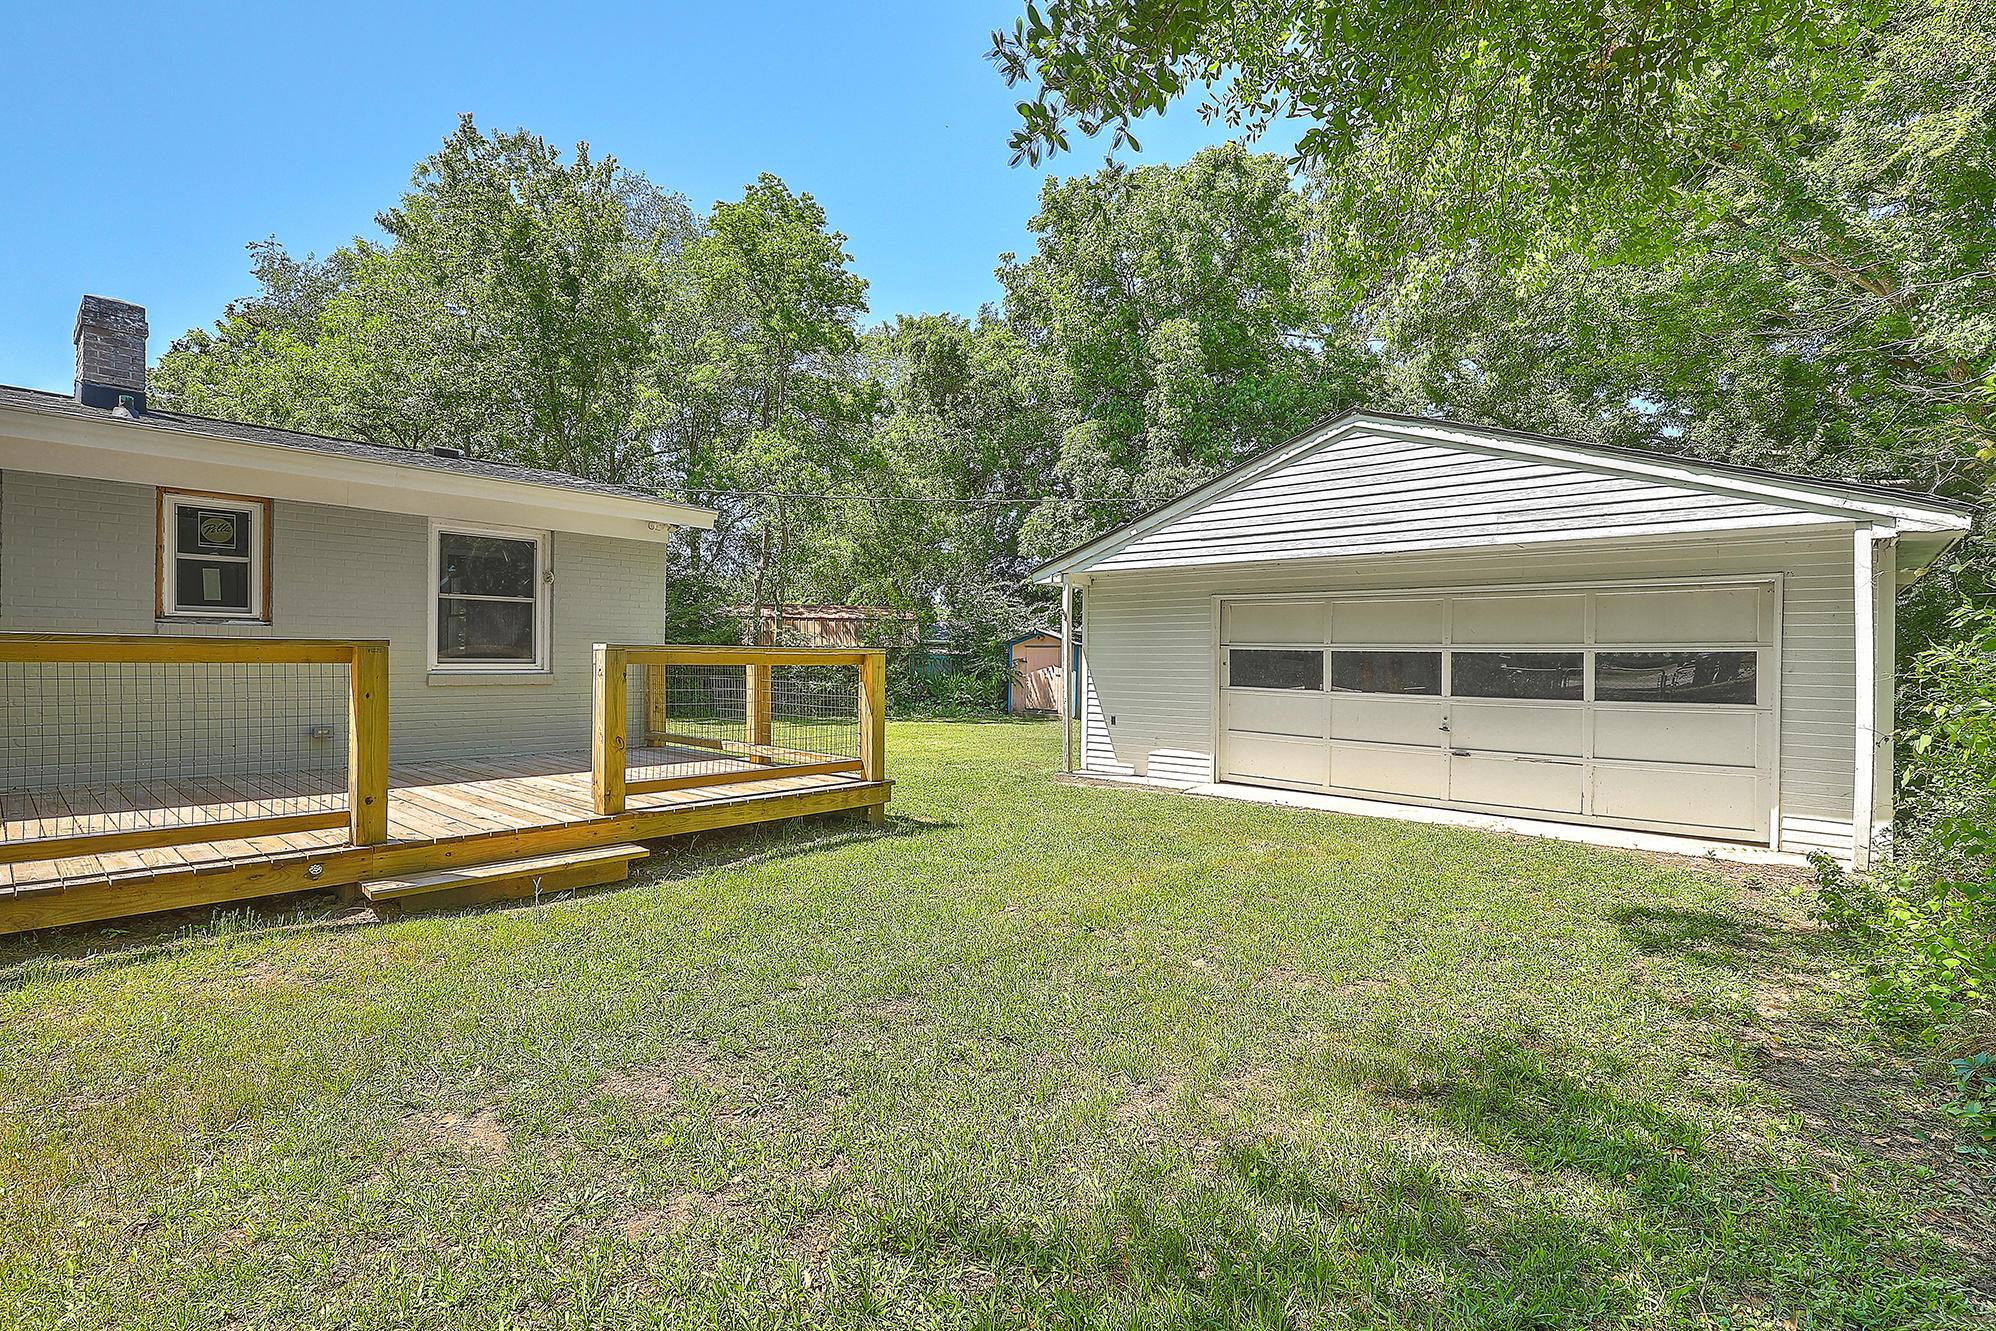 Lawton Bluff Homes For Sale - 847 Quail, Charleston, SC - 8